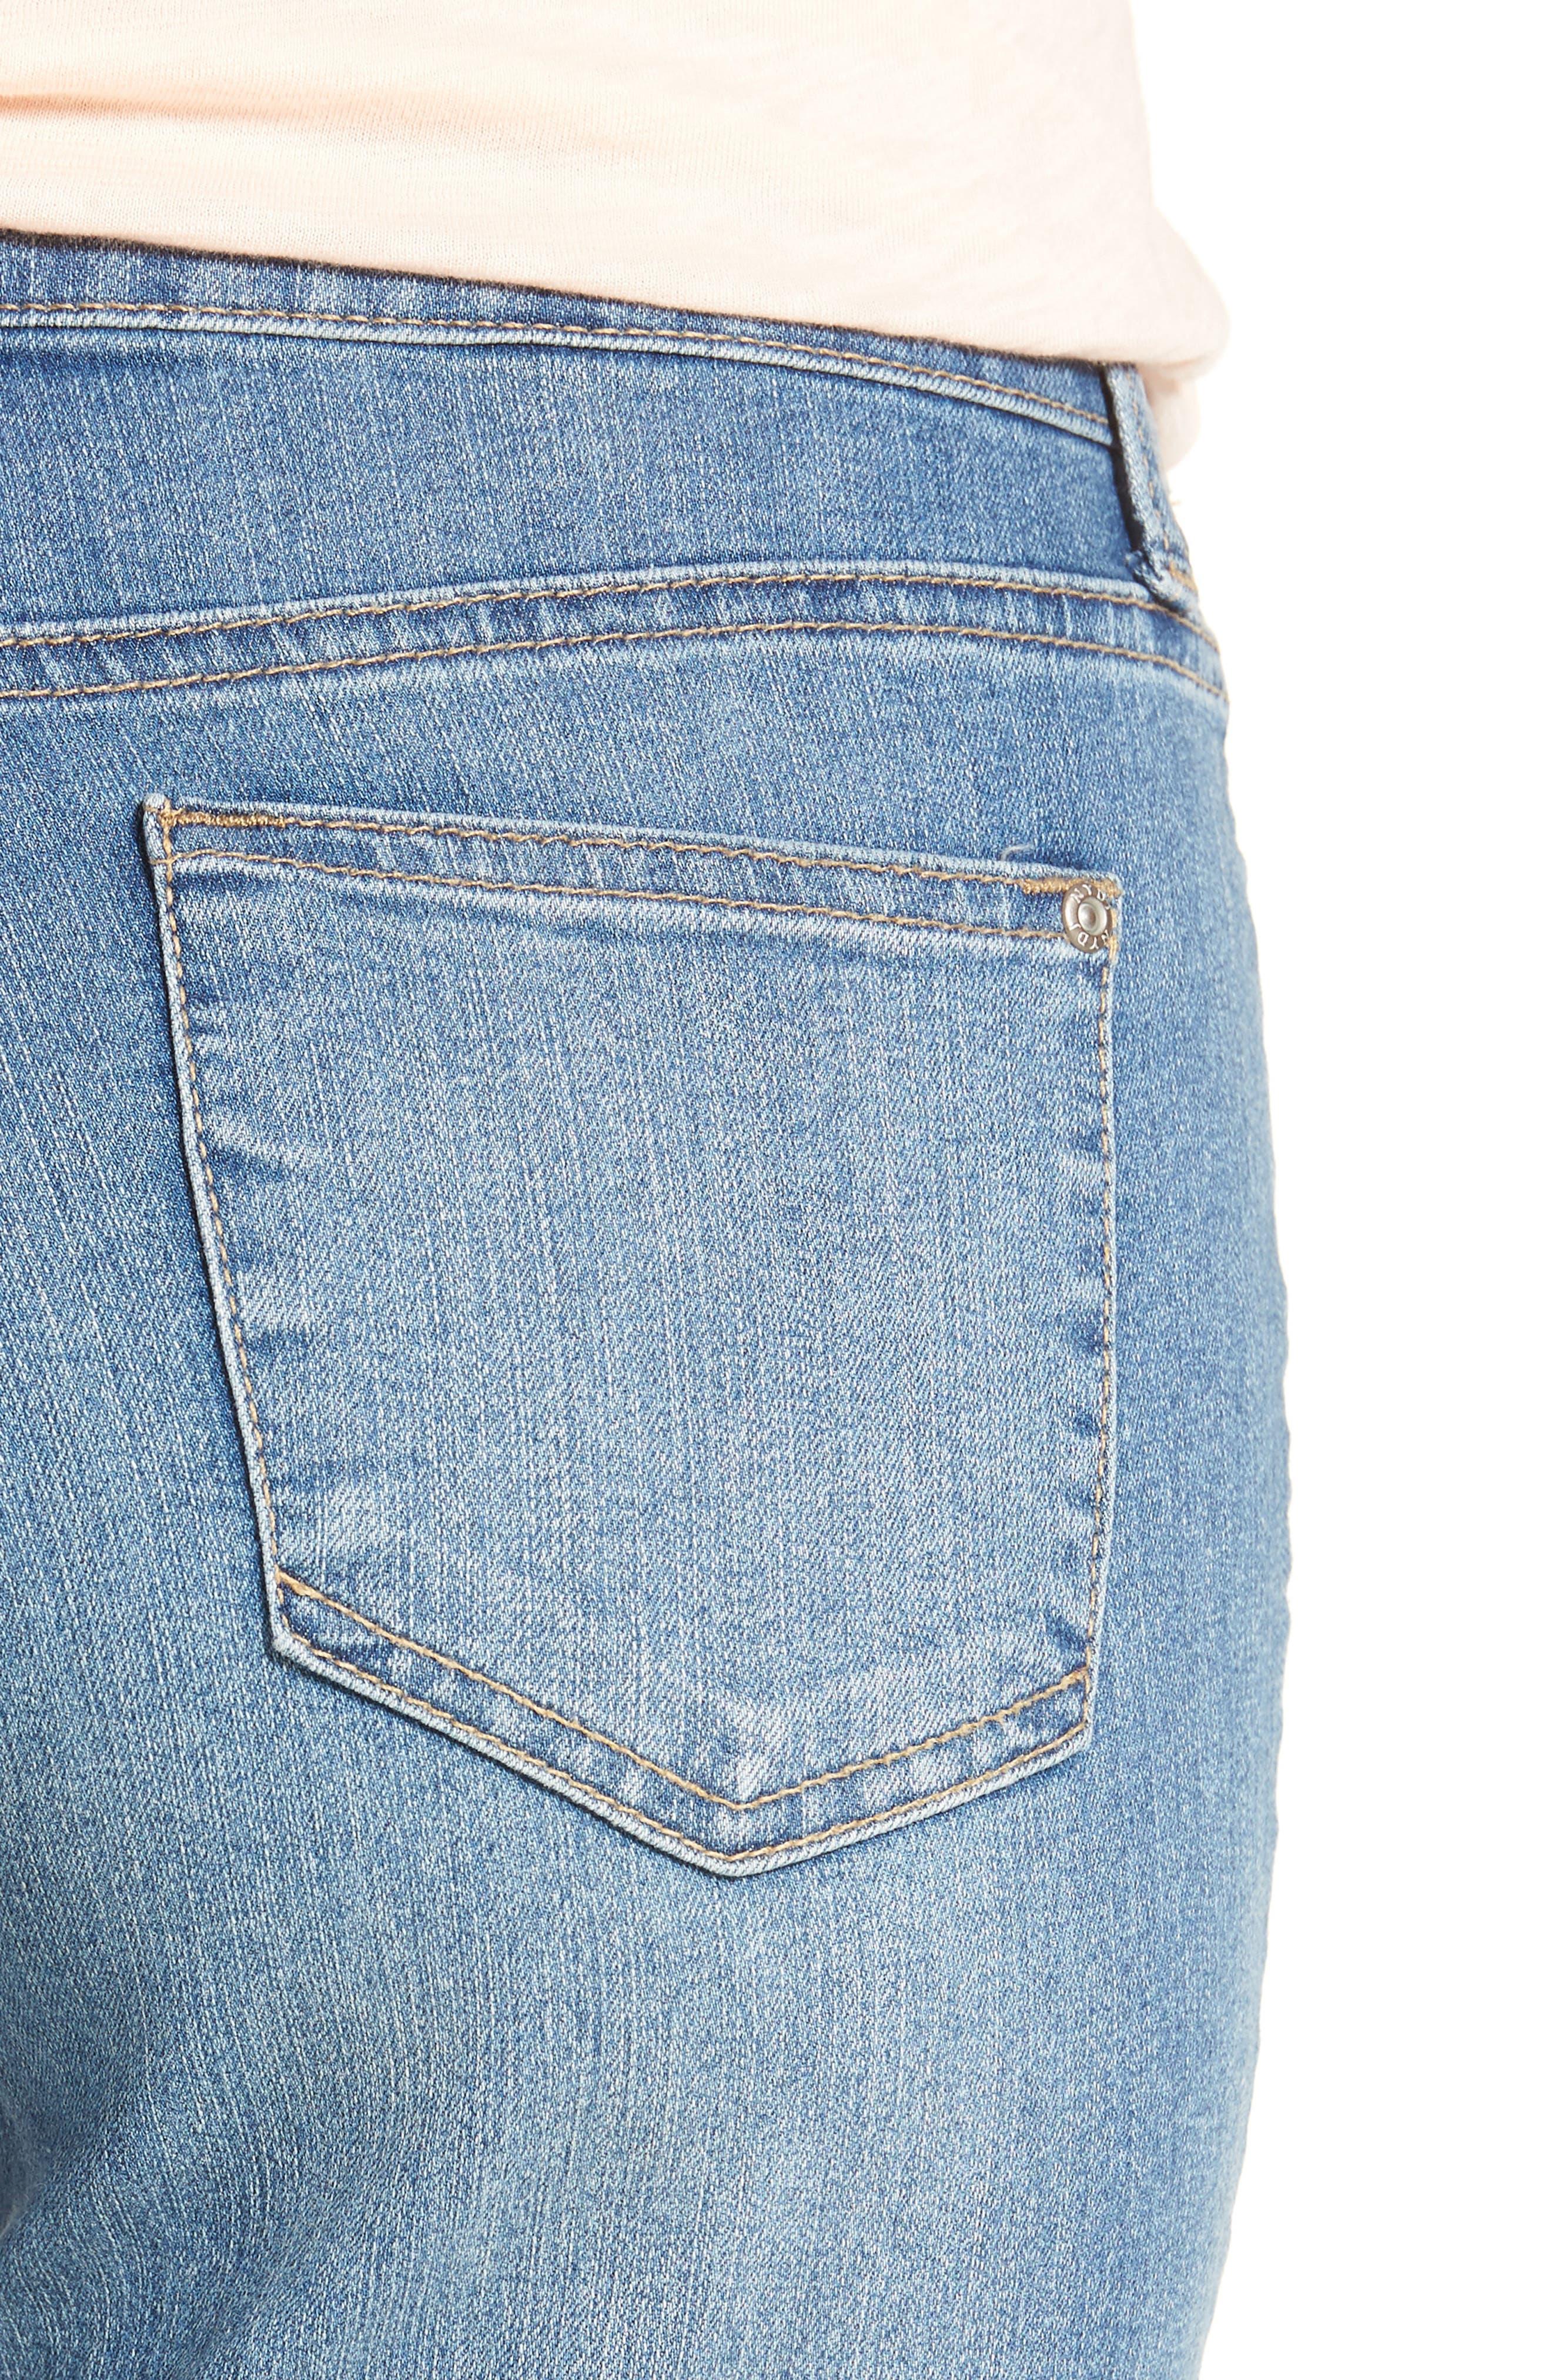 Alternate Image 4  - NYDJ Alina Skinny Jeans (Oxford)